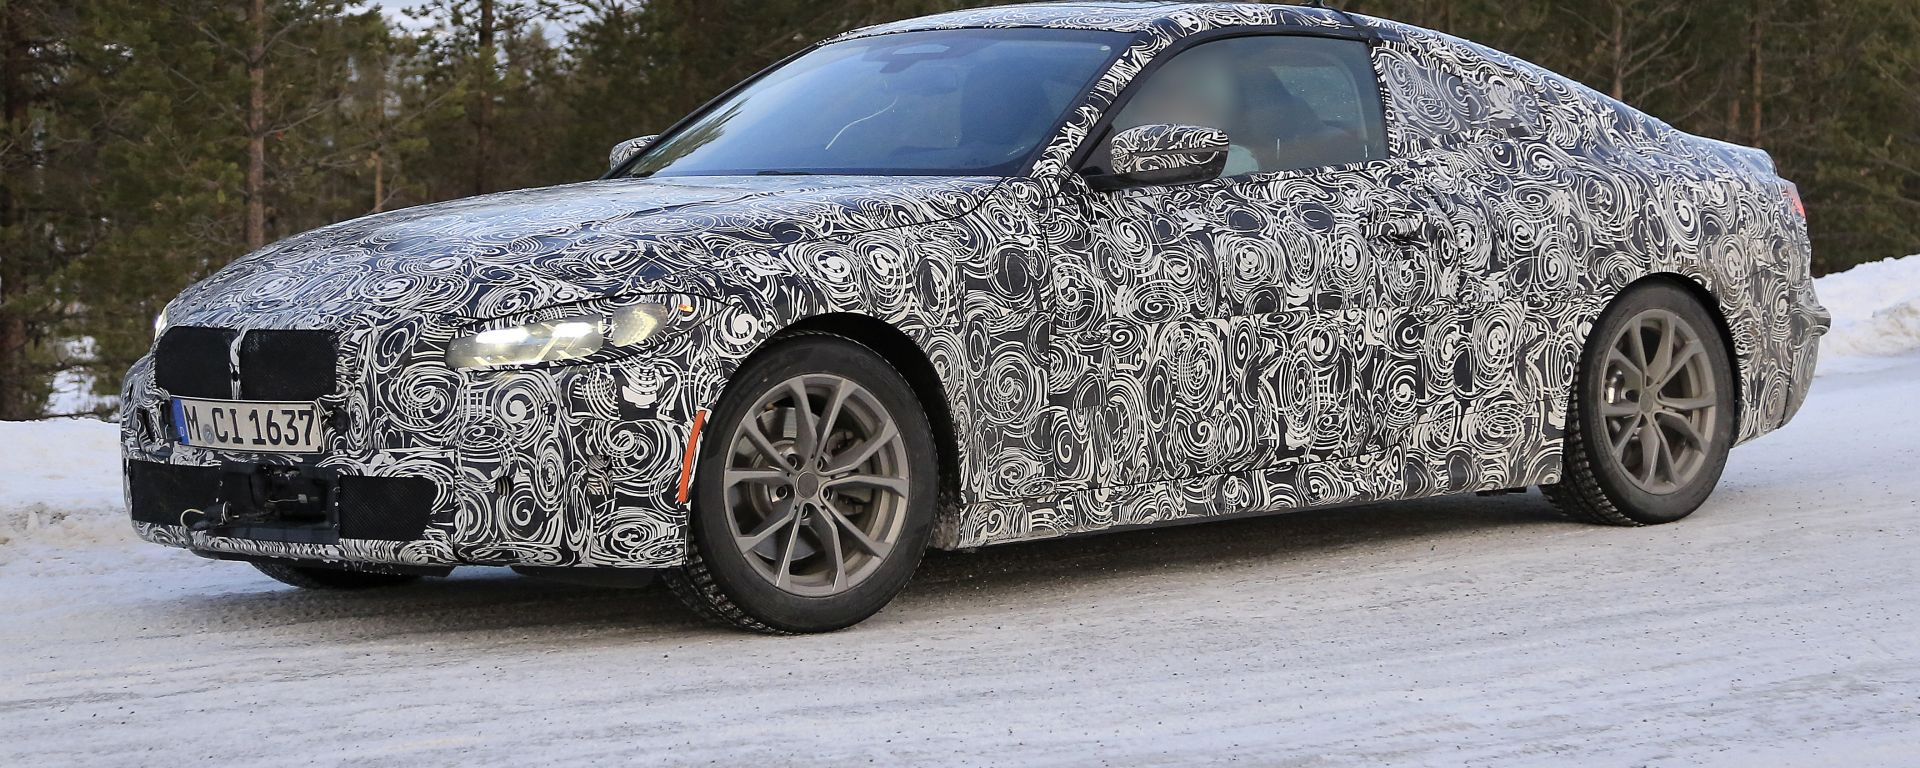 BMW Serie 4 Coupé: impegnata nei collaudi su strada